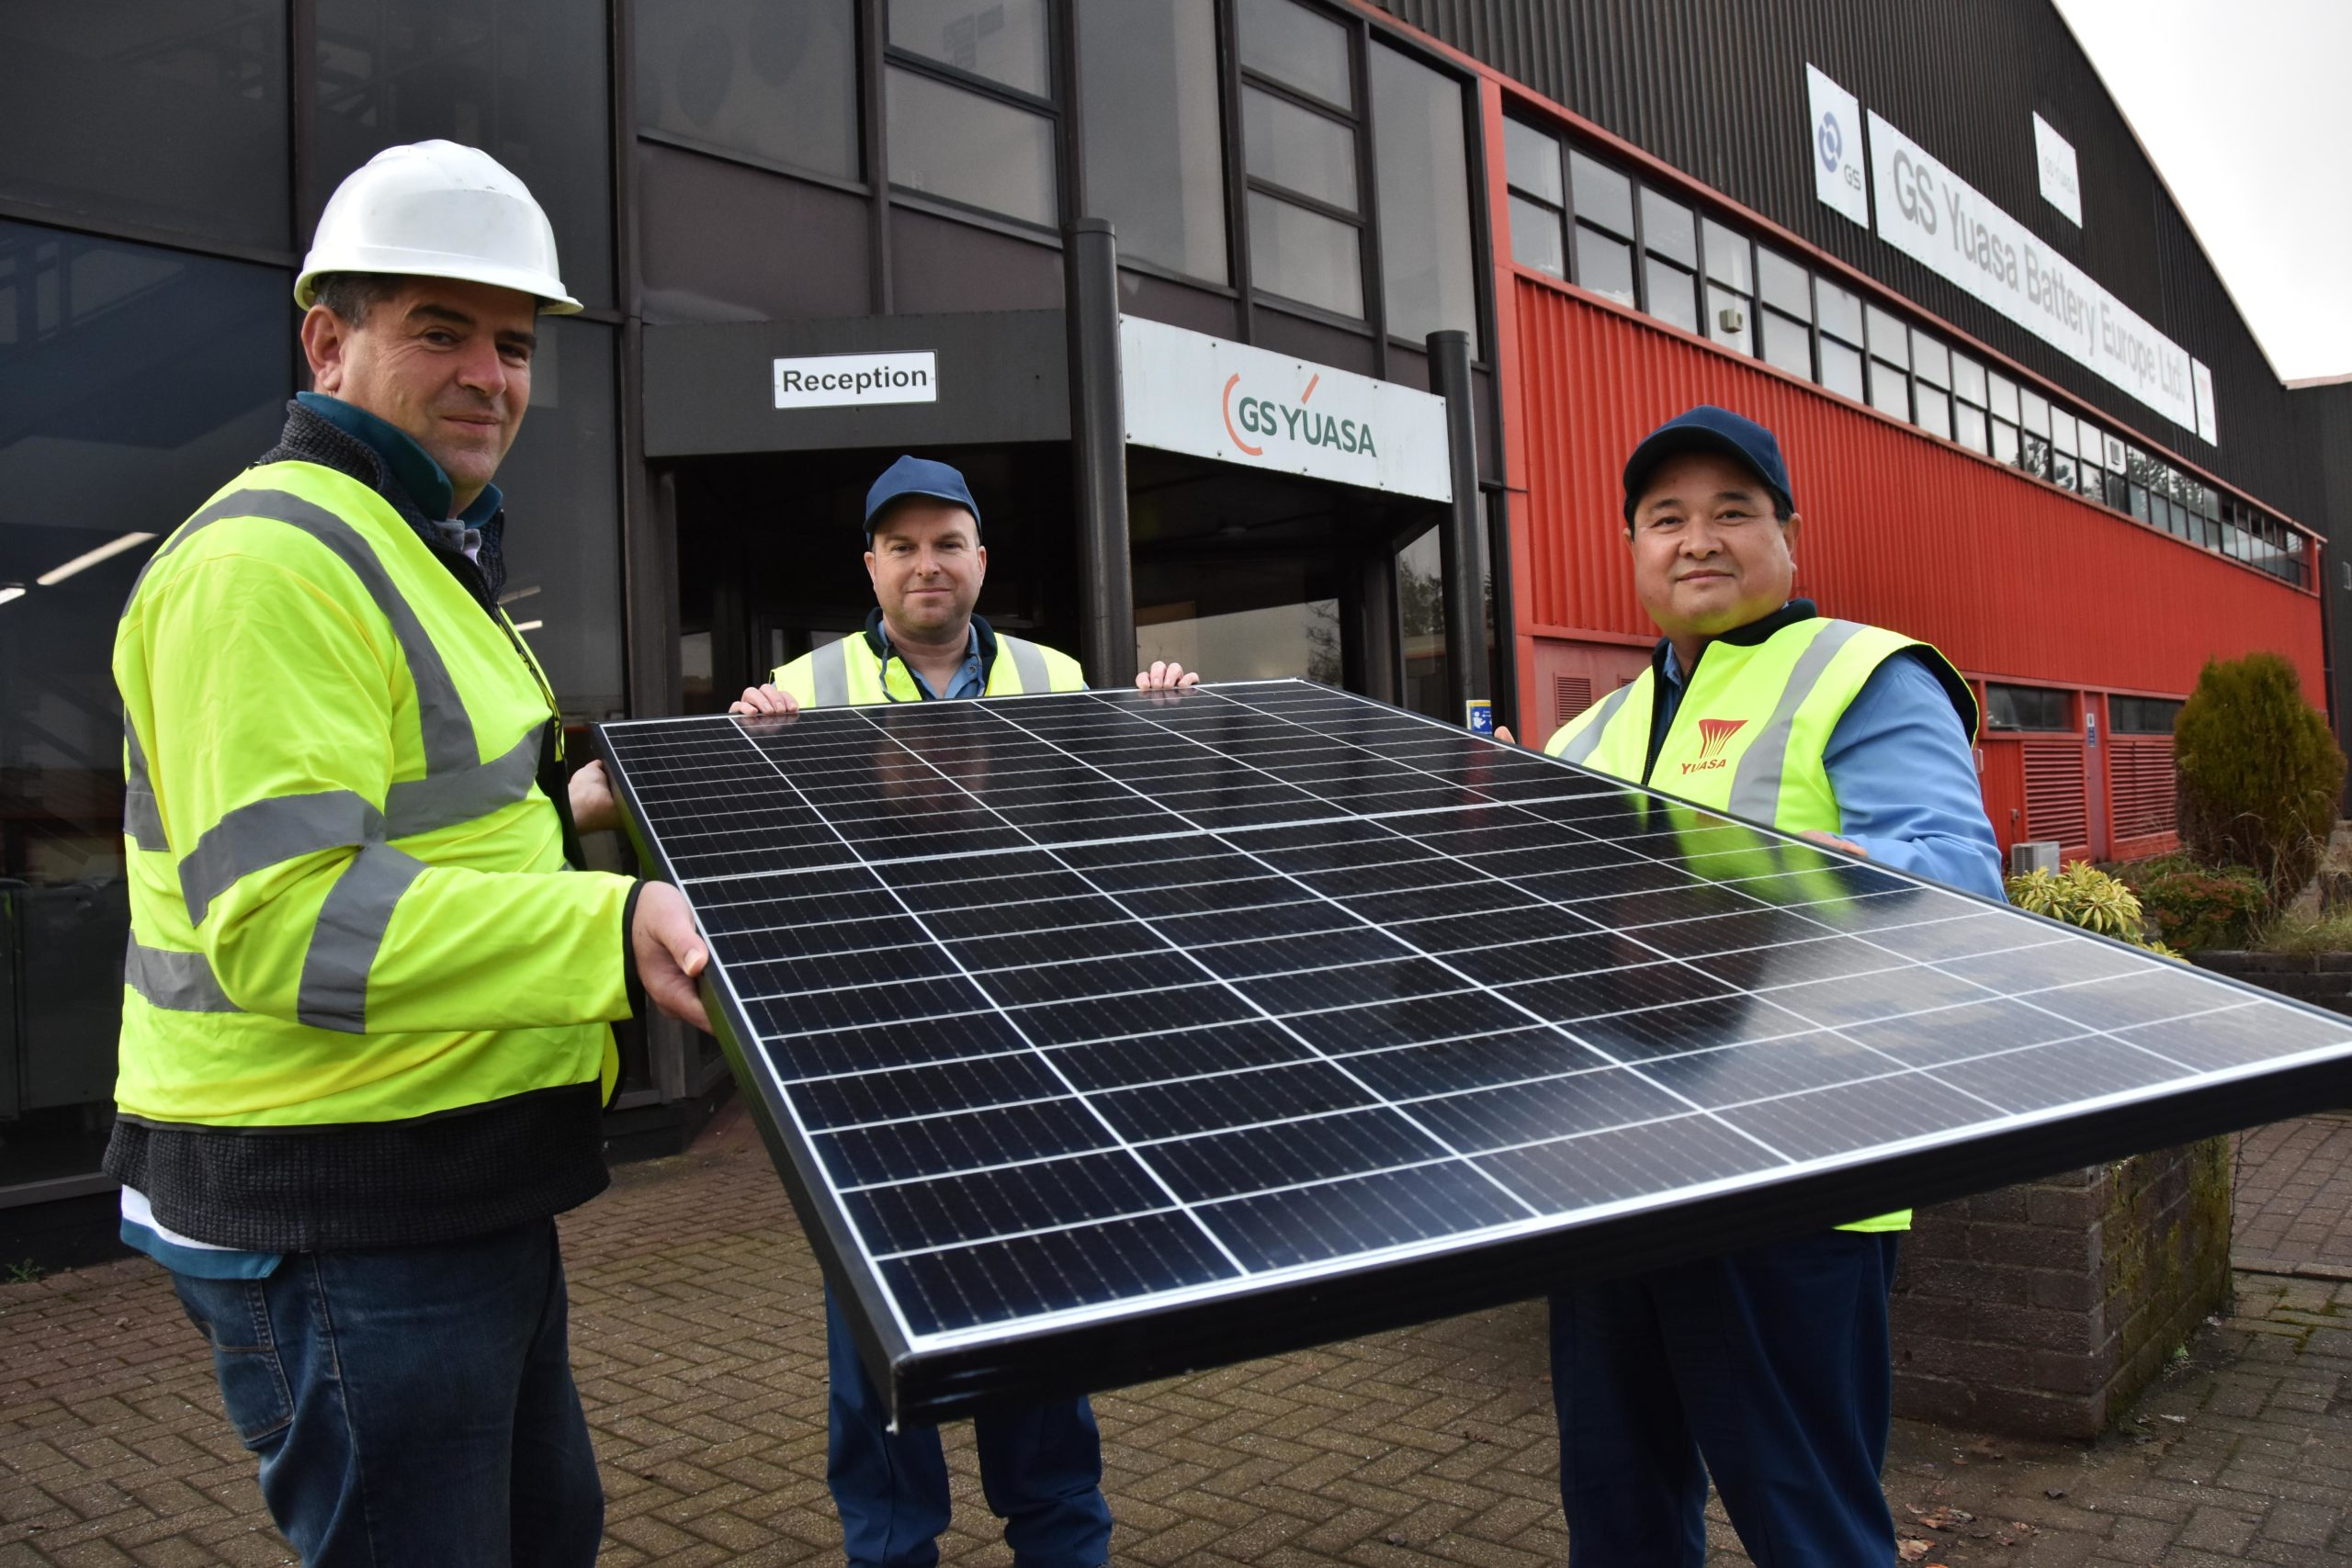 Solar installation begins at GS Yuasa factory in South Wales